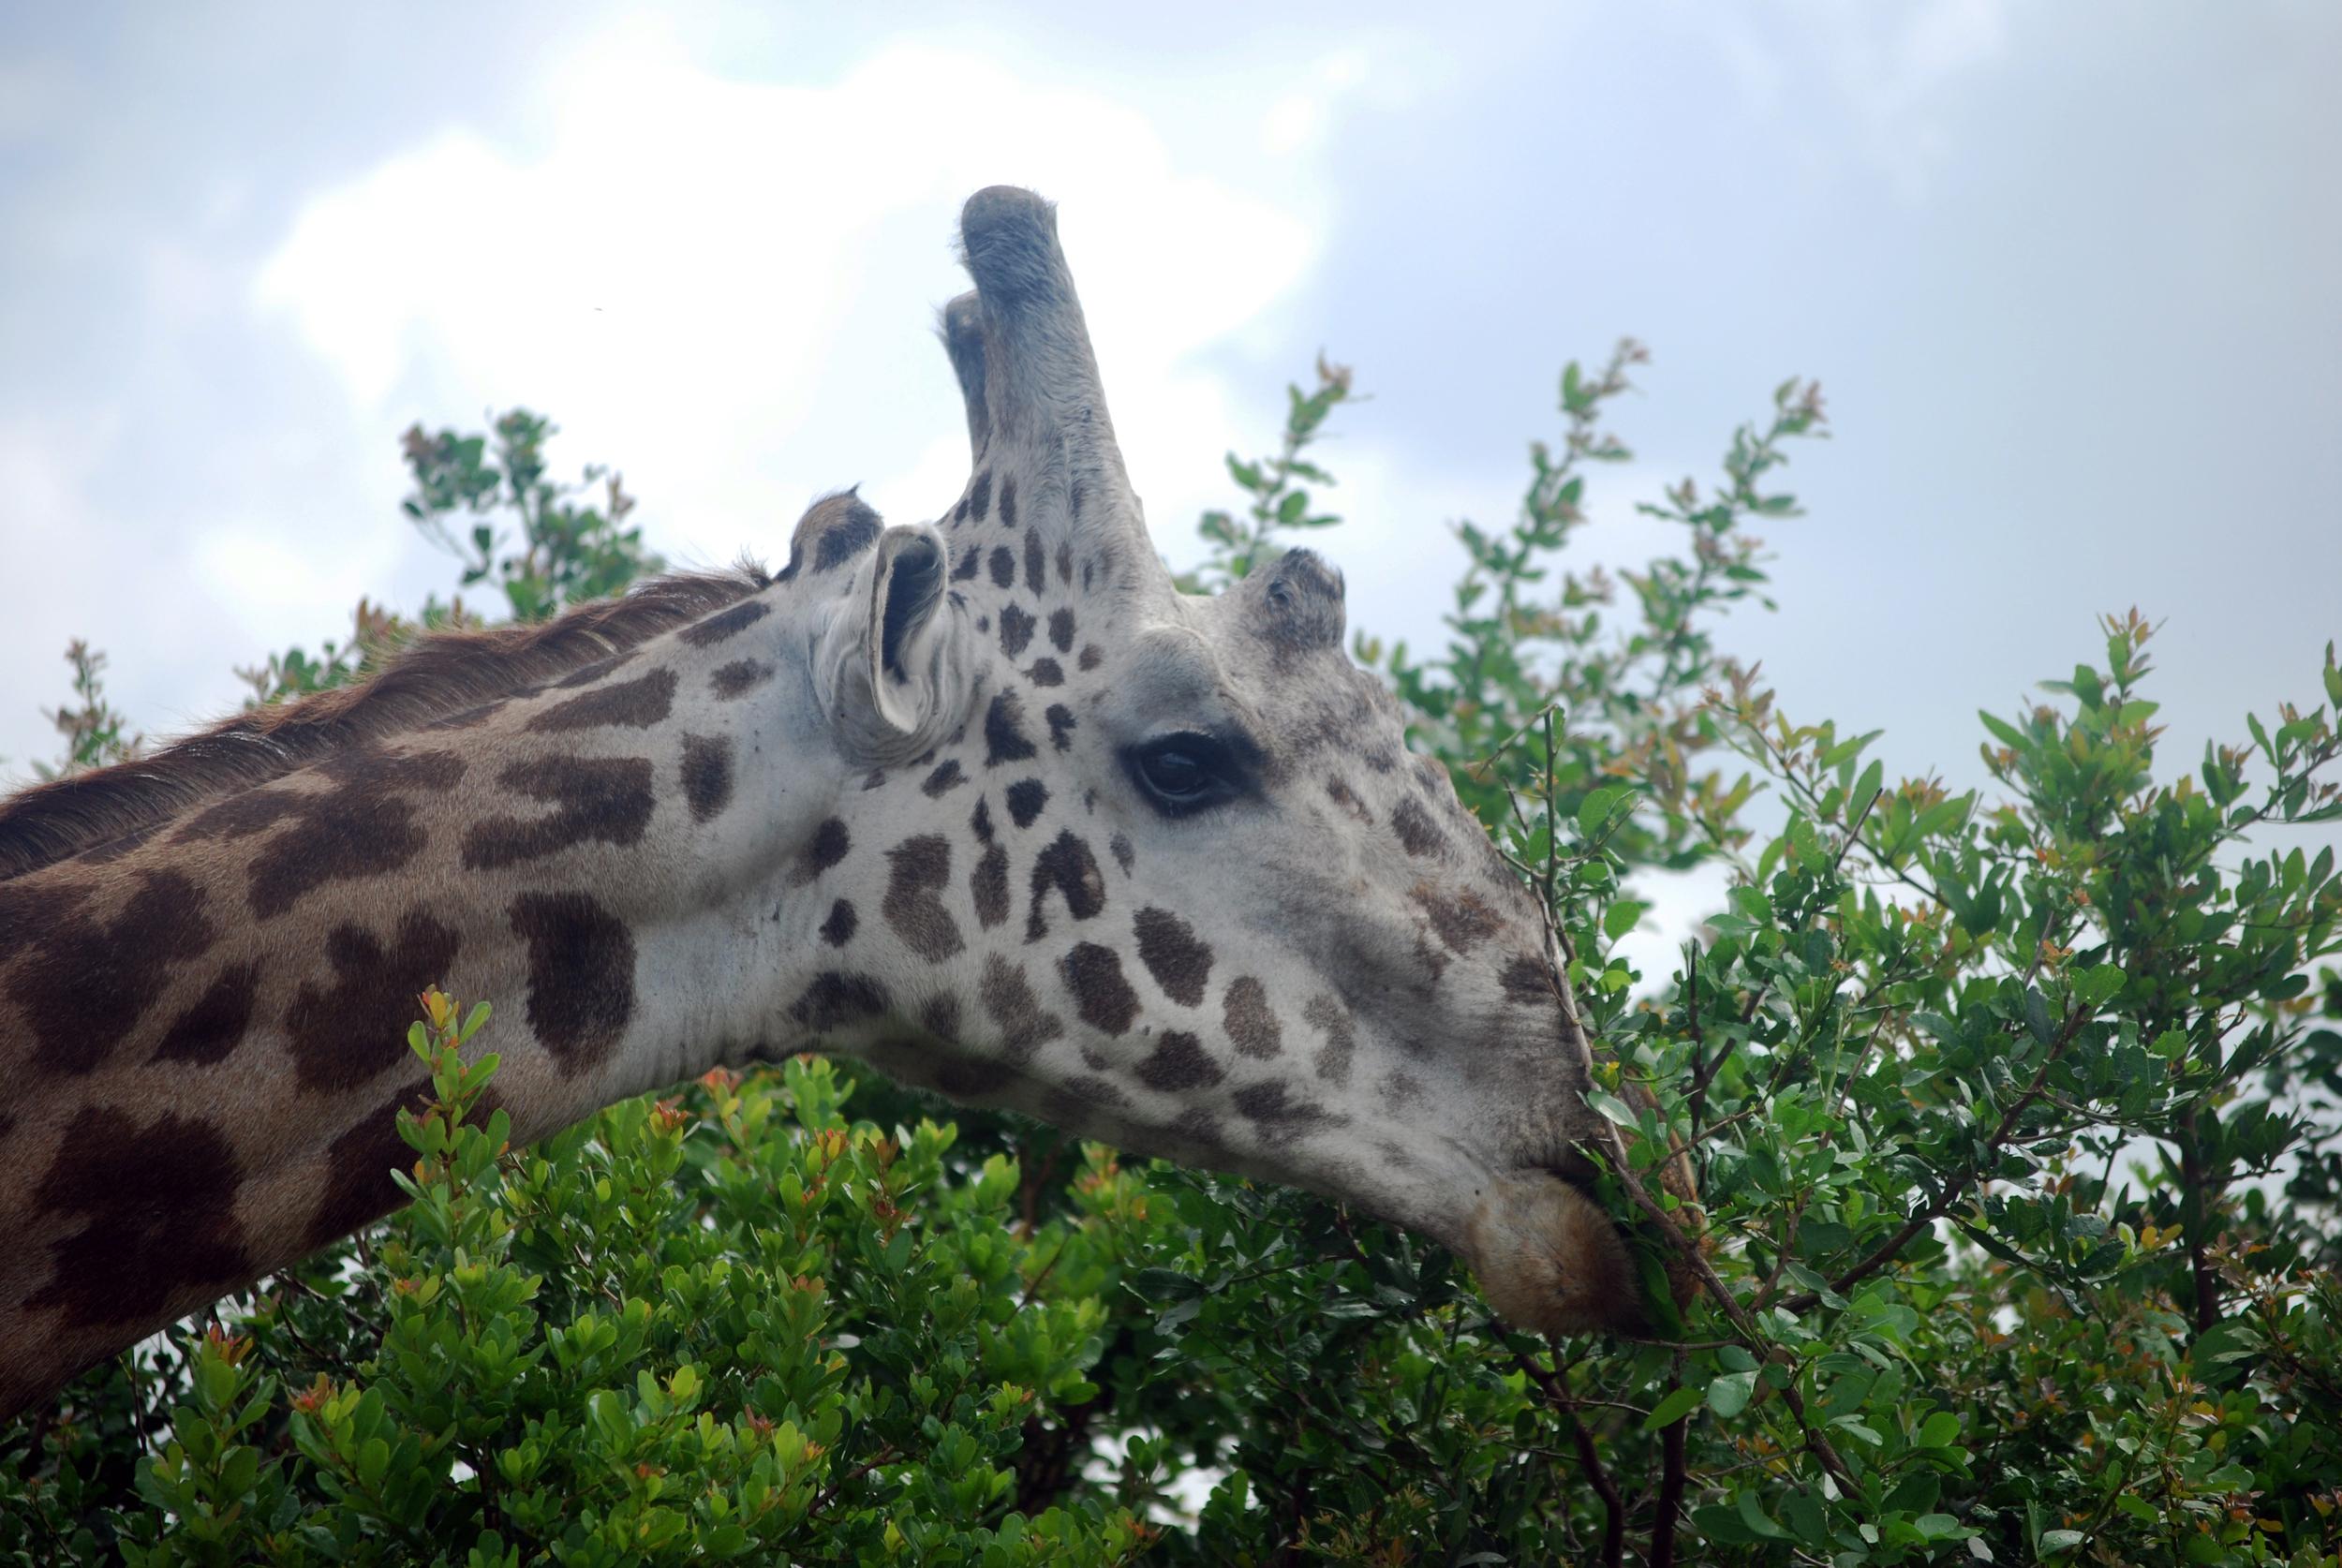 Giraffe feeding. Nairobi National Park, Kenya, 2013.